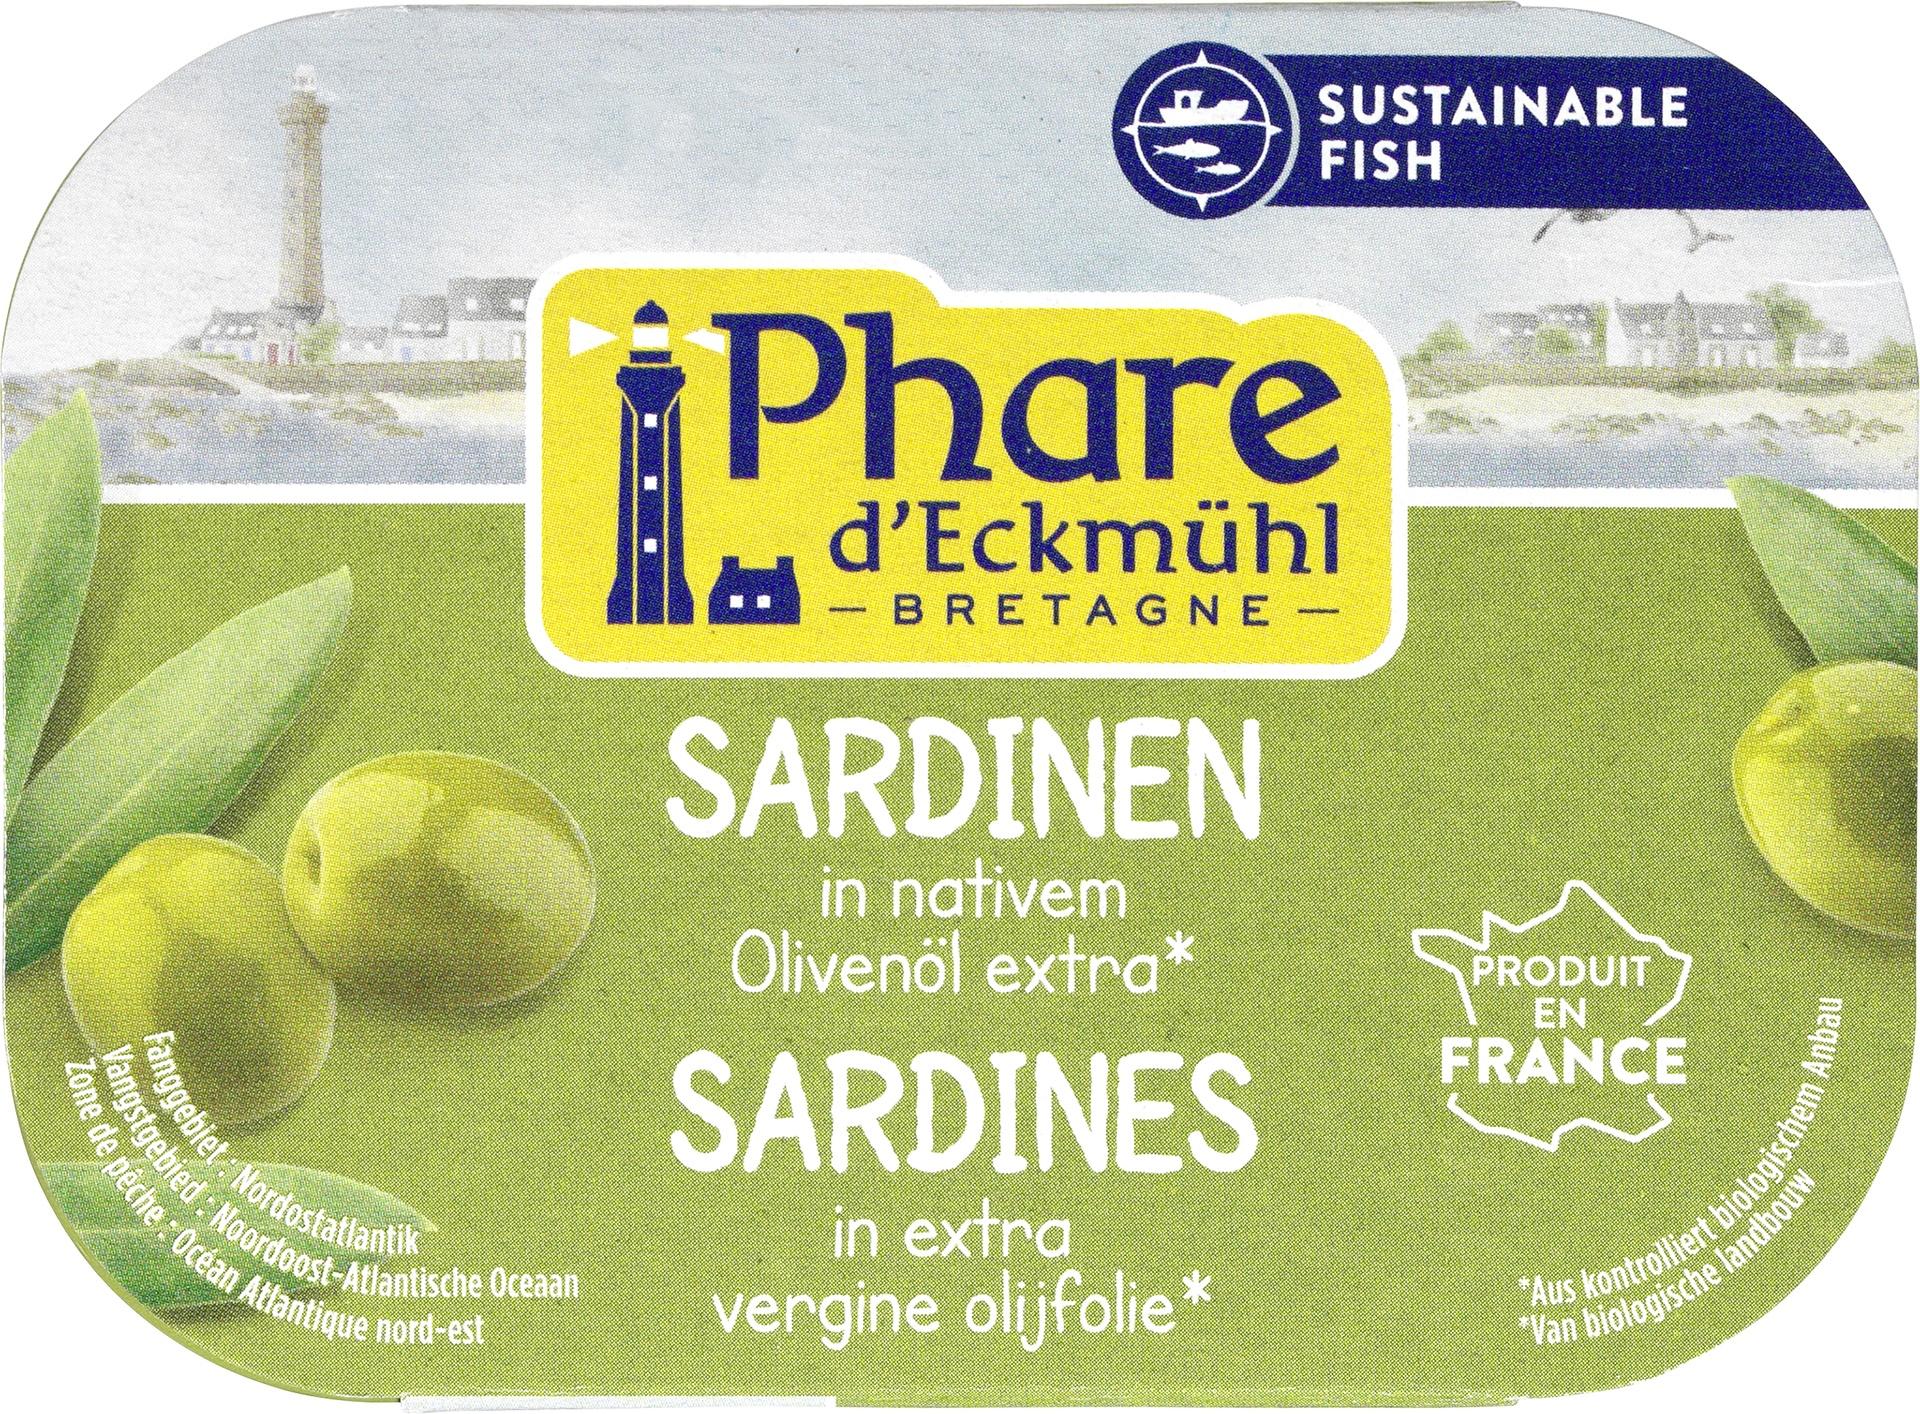 Biologische Phare d'Eckmühl Sardines Bretagne 135 gr